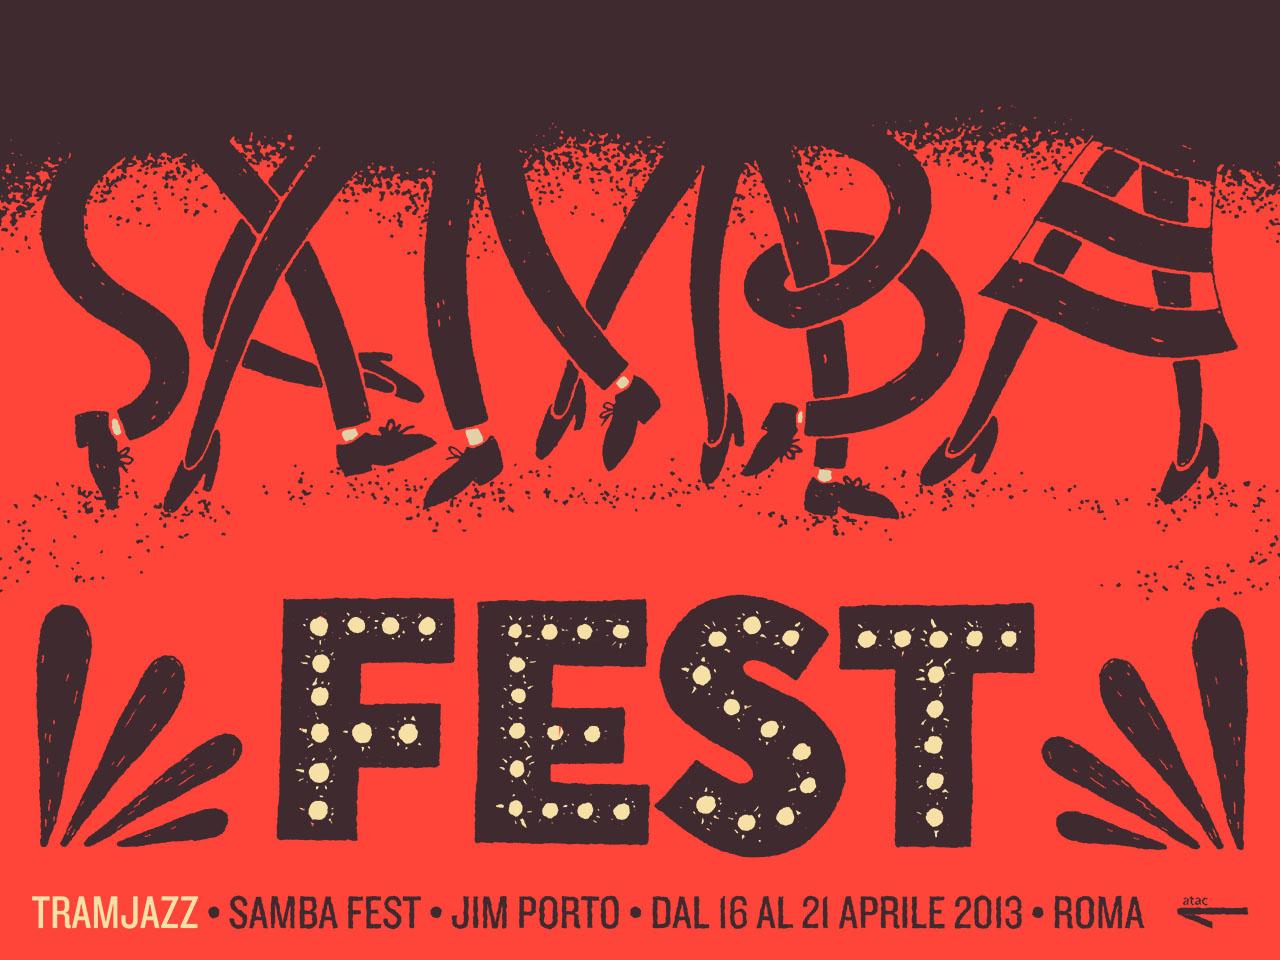 TramJazz Samba Fest